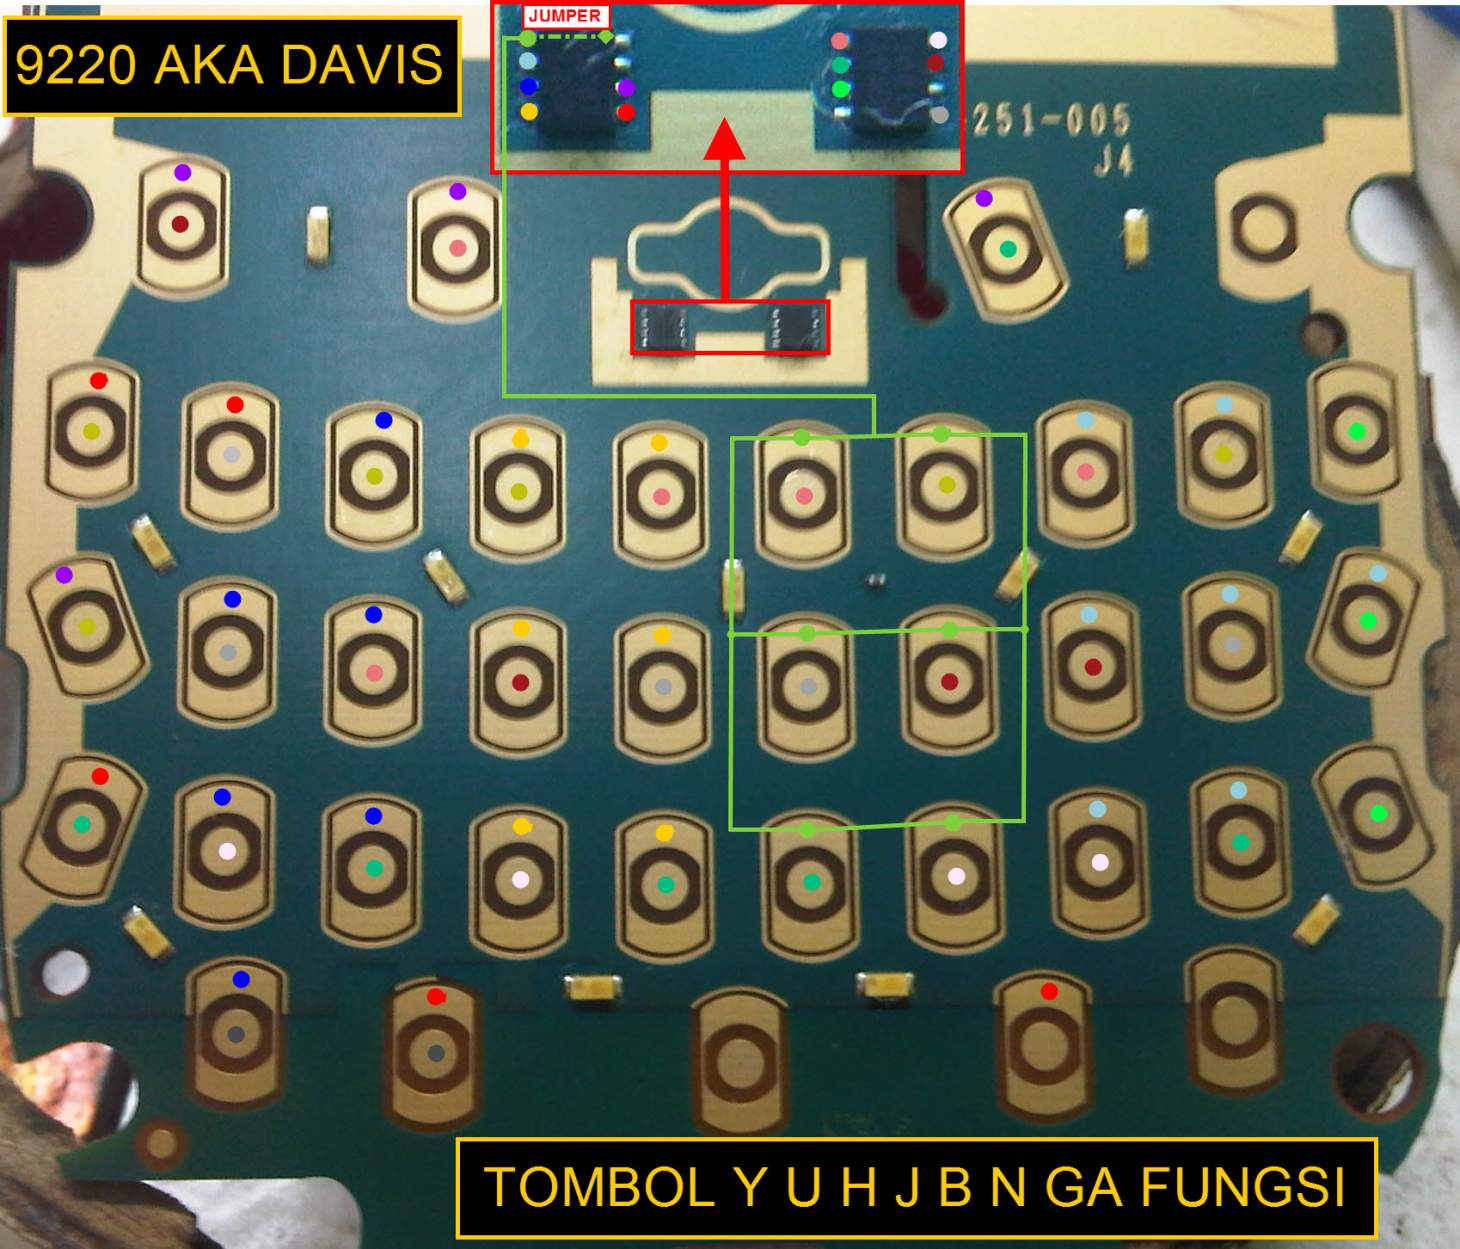 January 2013 Bruno Brunosari Plug In Smartfreen Andormax C Ad686g Bb 9220 9320 Written By Raja Unlock On Sunday 27 156 Pm